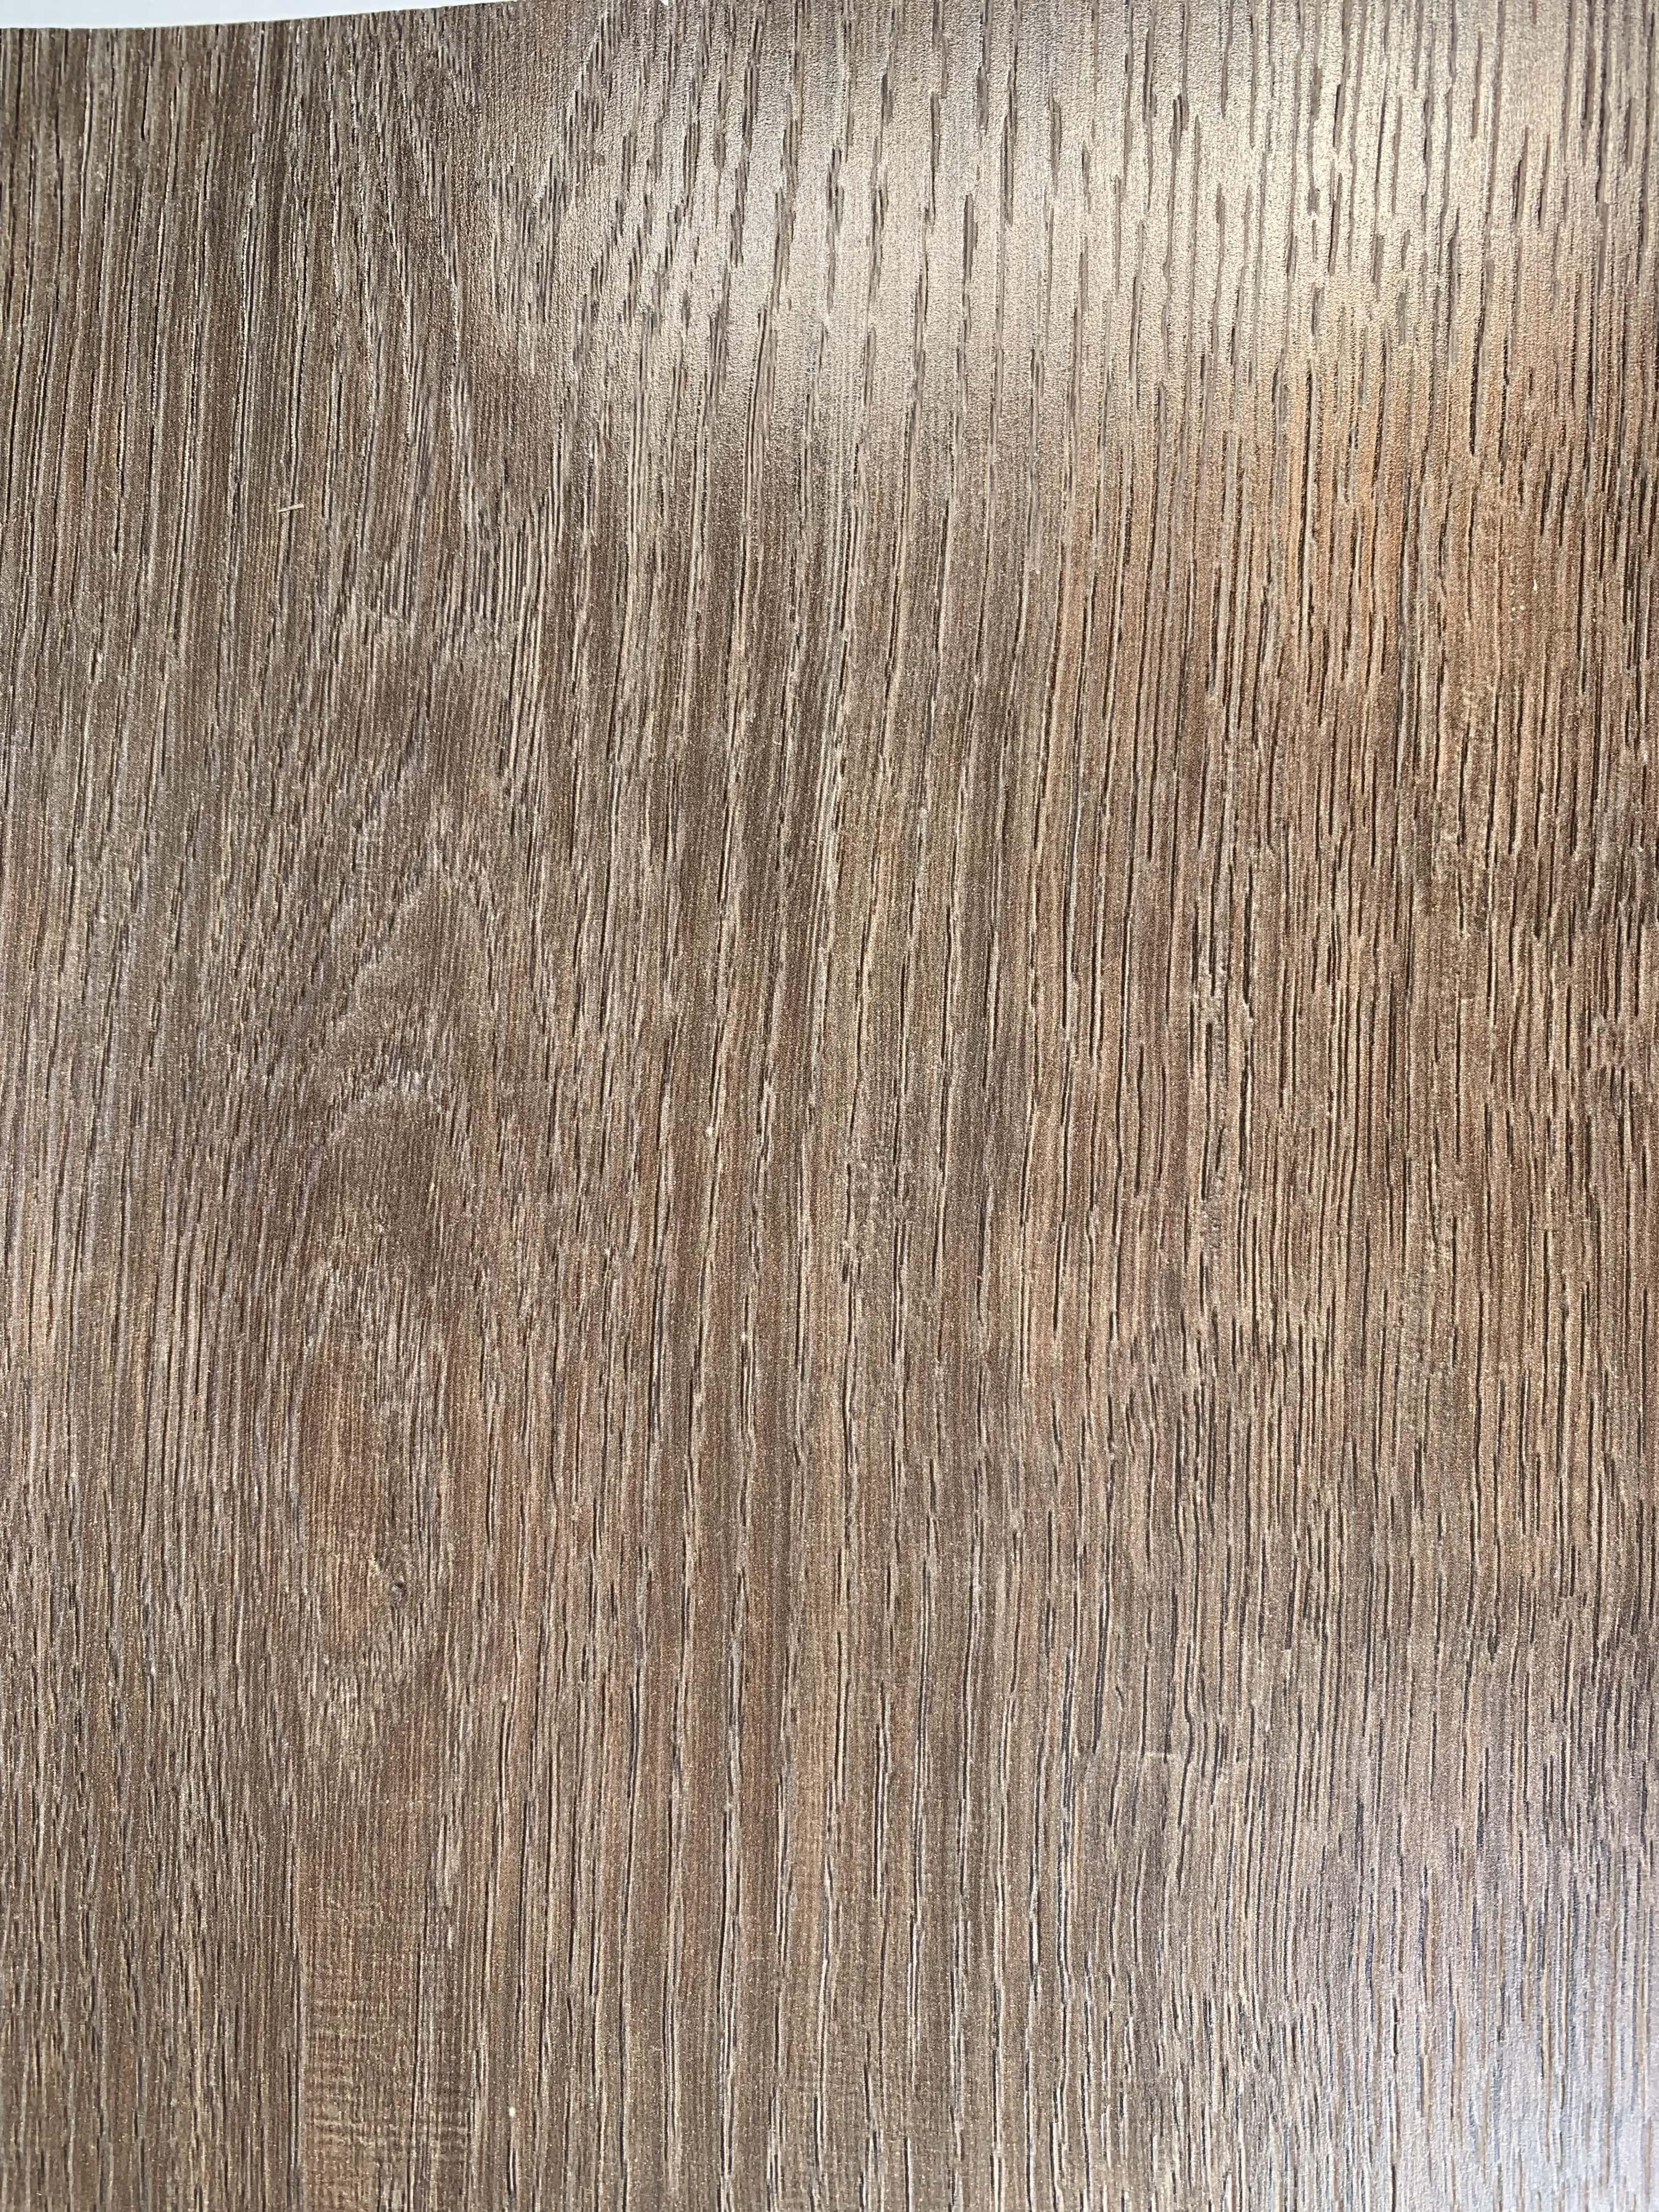 French Oak Laminate Flooring 1215x195x12mm